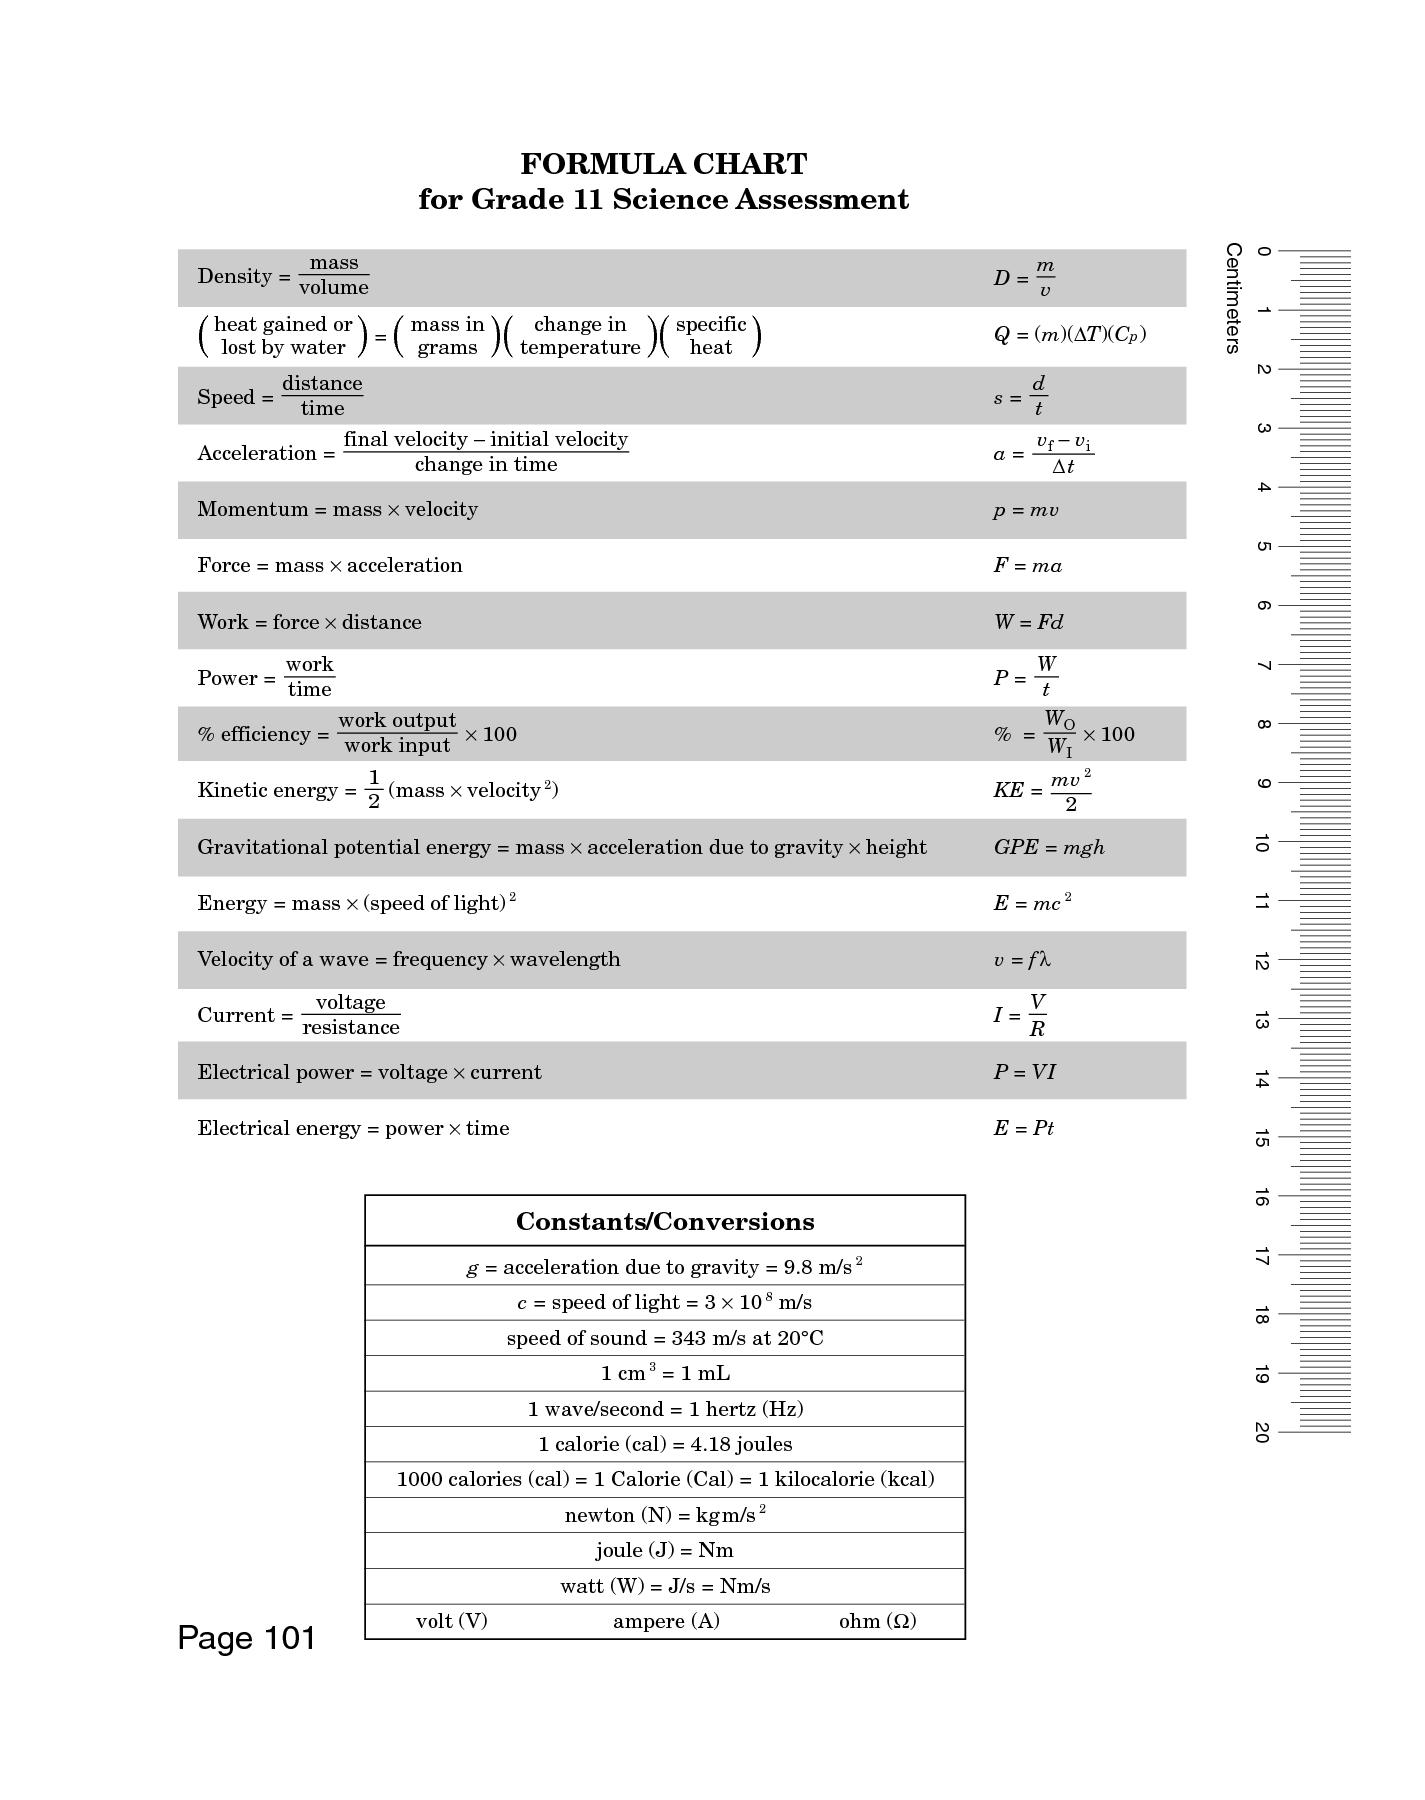 Formula Chart For Grade 11 Science Assessment